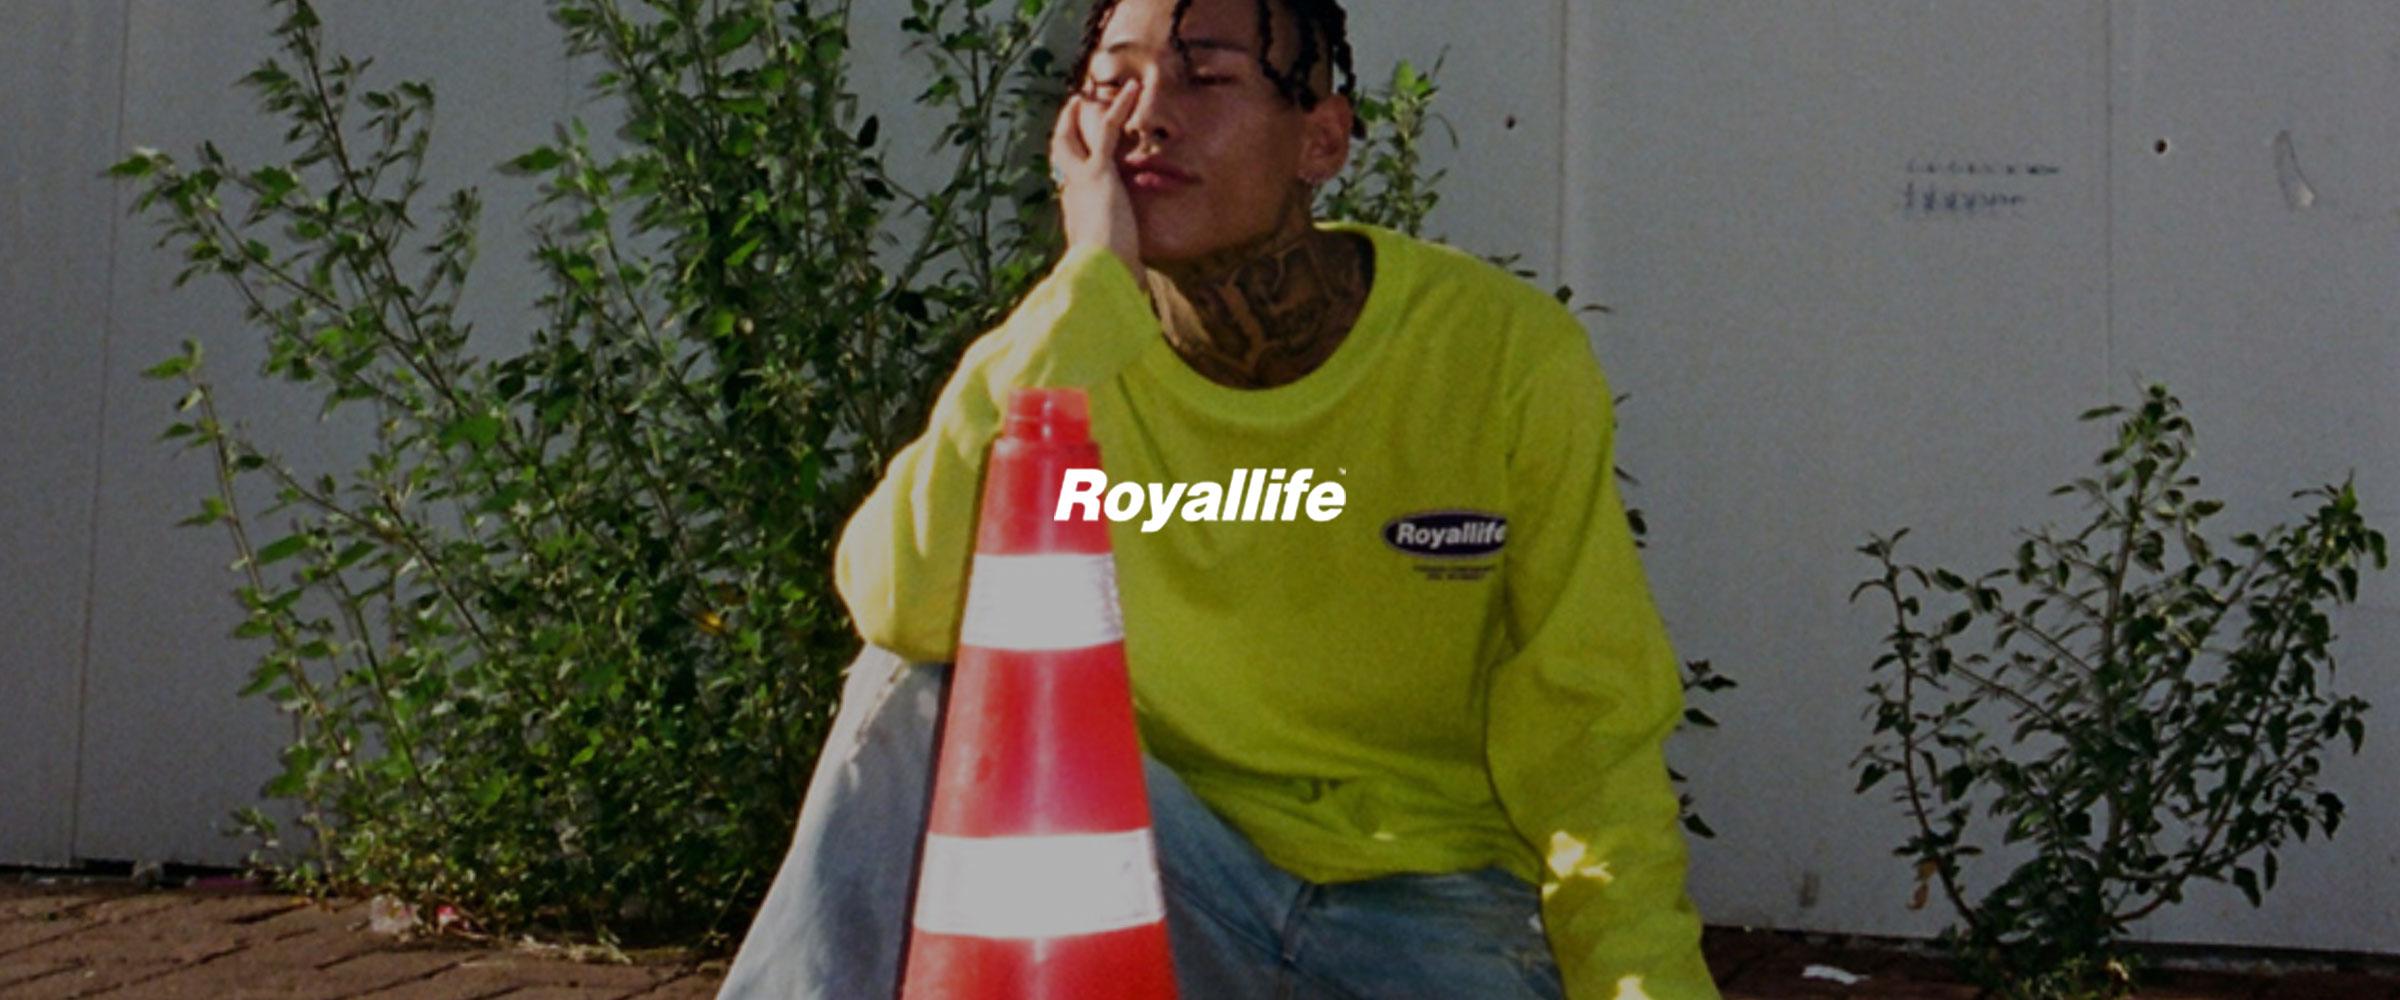 royallife.jpg